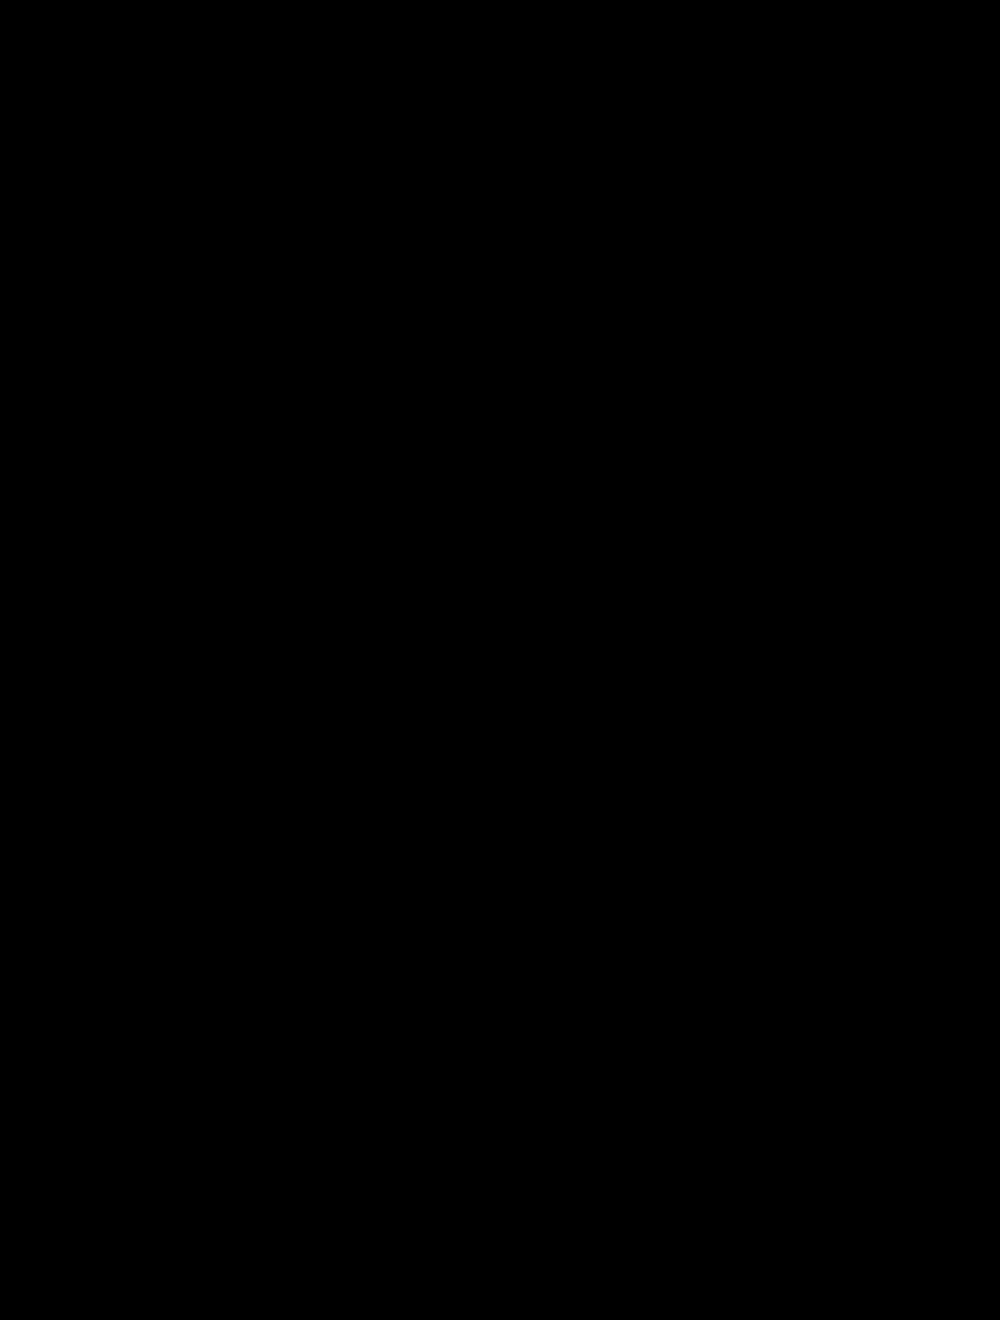 Download The New York Times Style Magazine Singapore White Logo Nyt Style Magazine Logo Full Size Png Image Pngkit